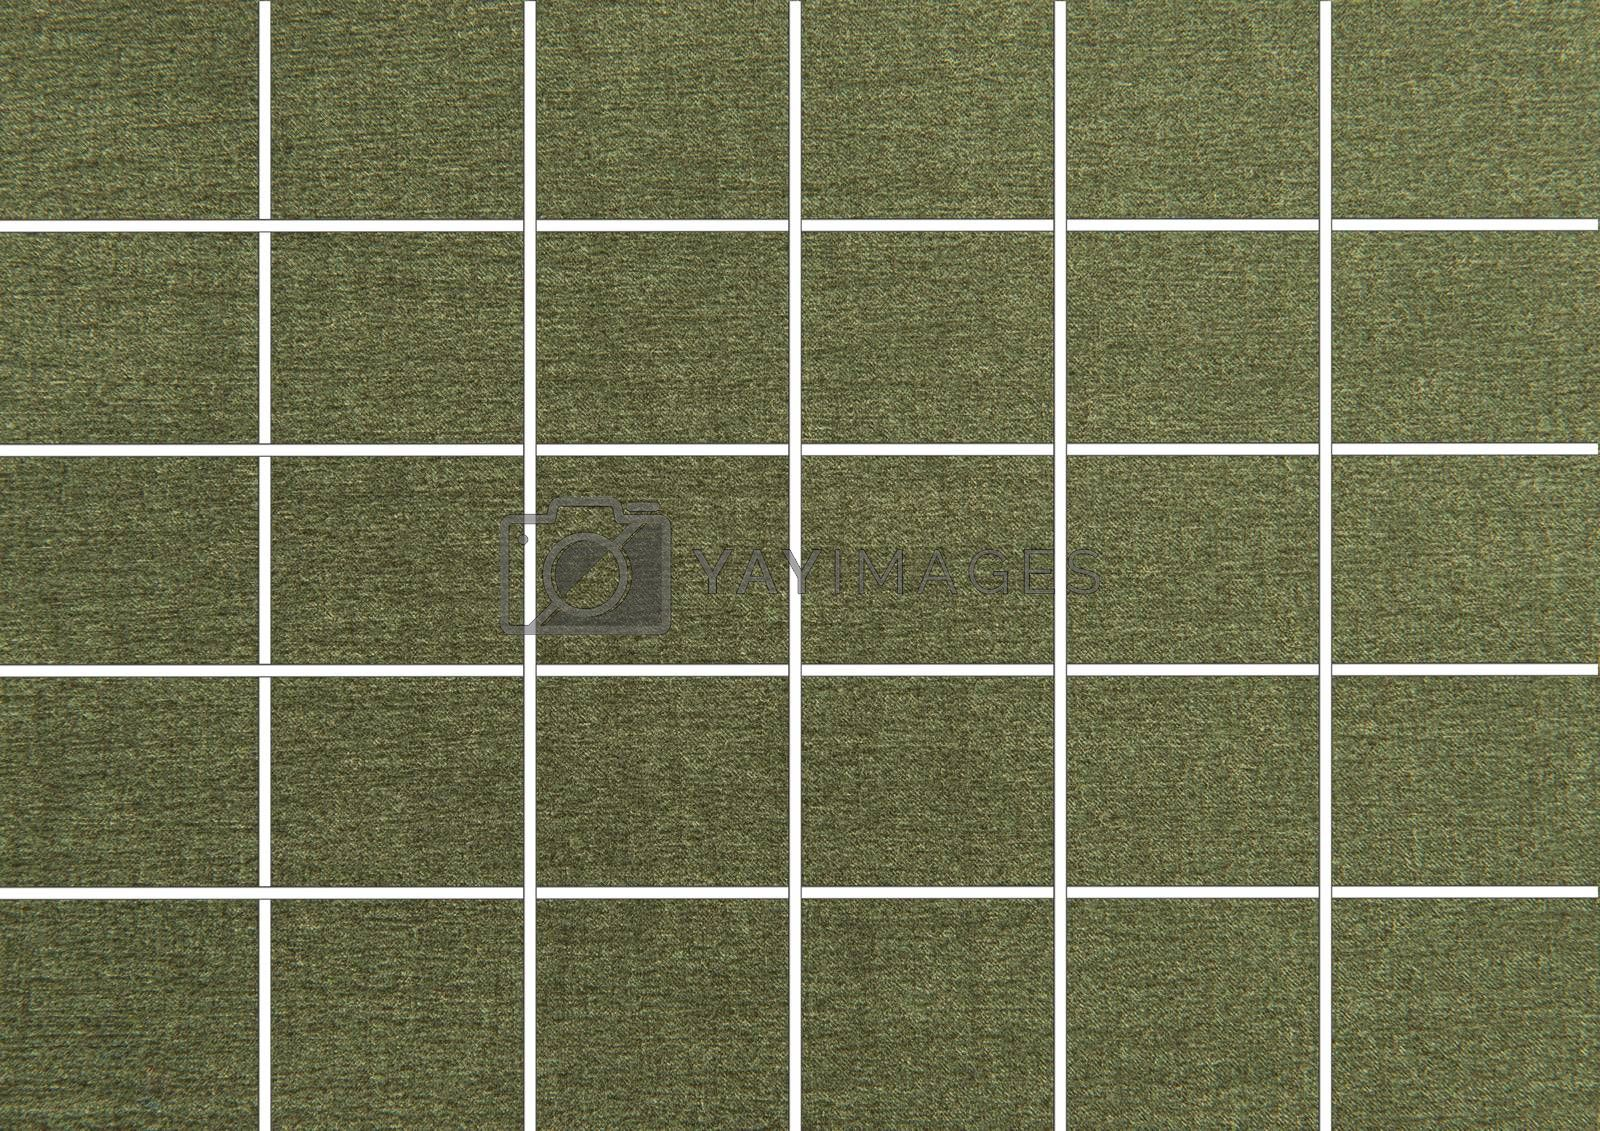 Green Tiles. Seamless Tileable Texture.